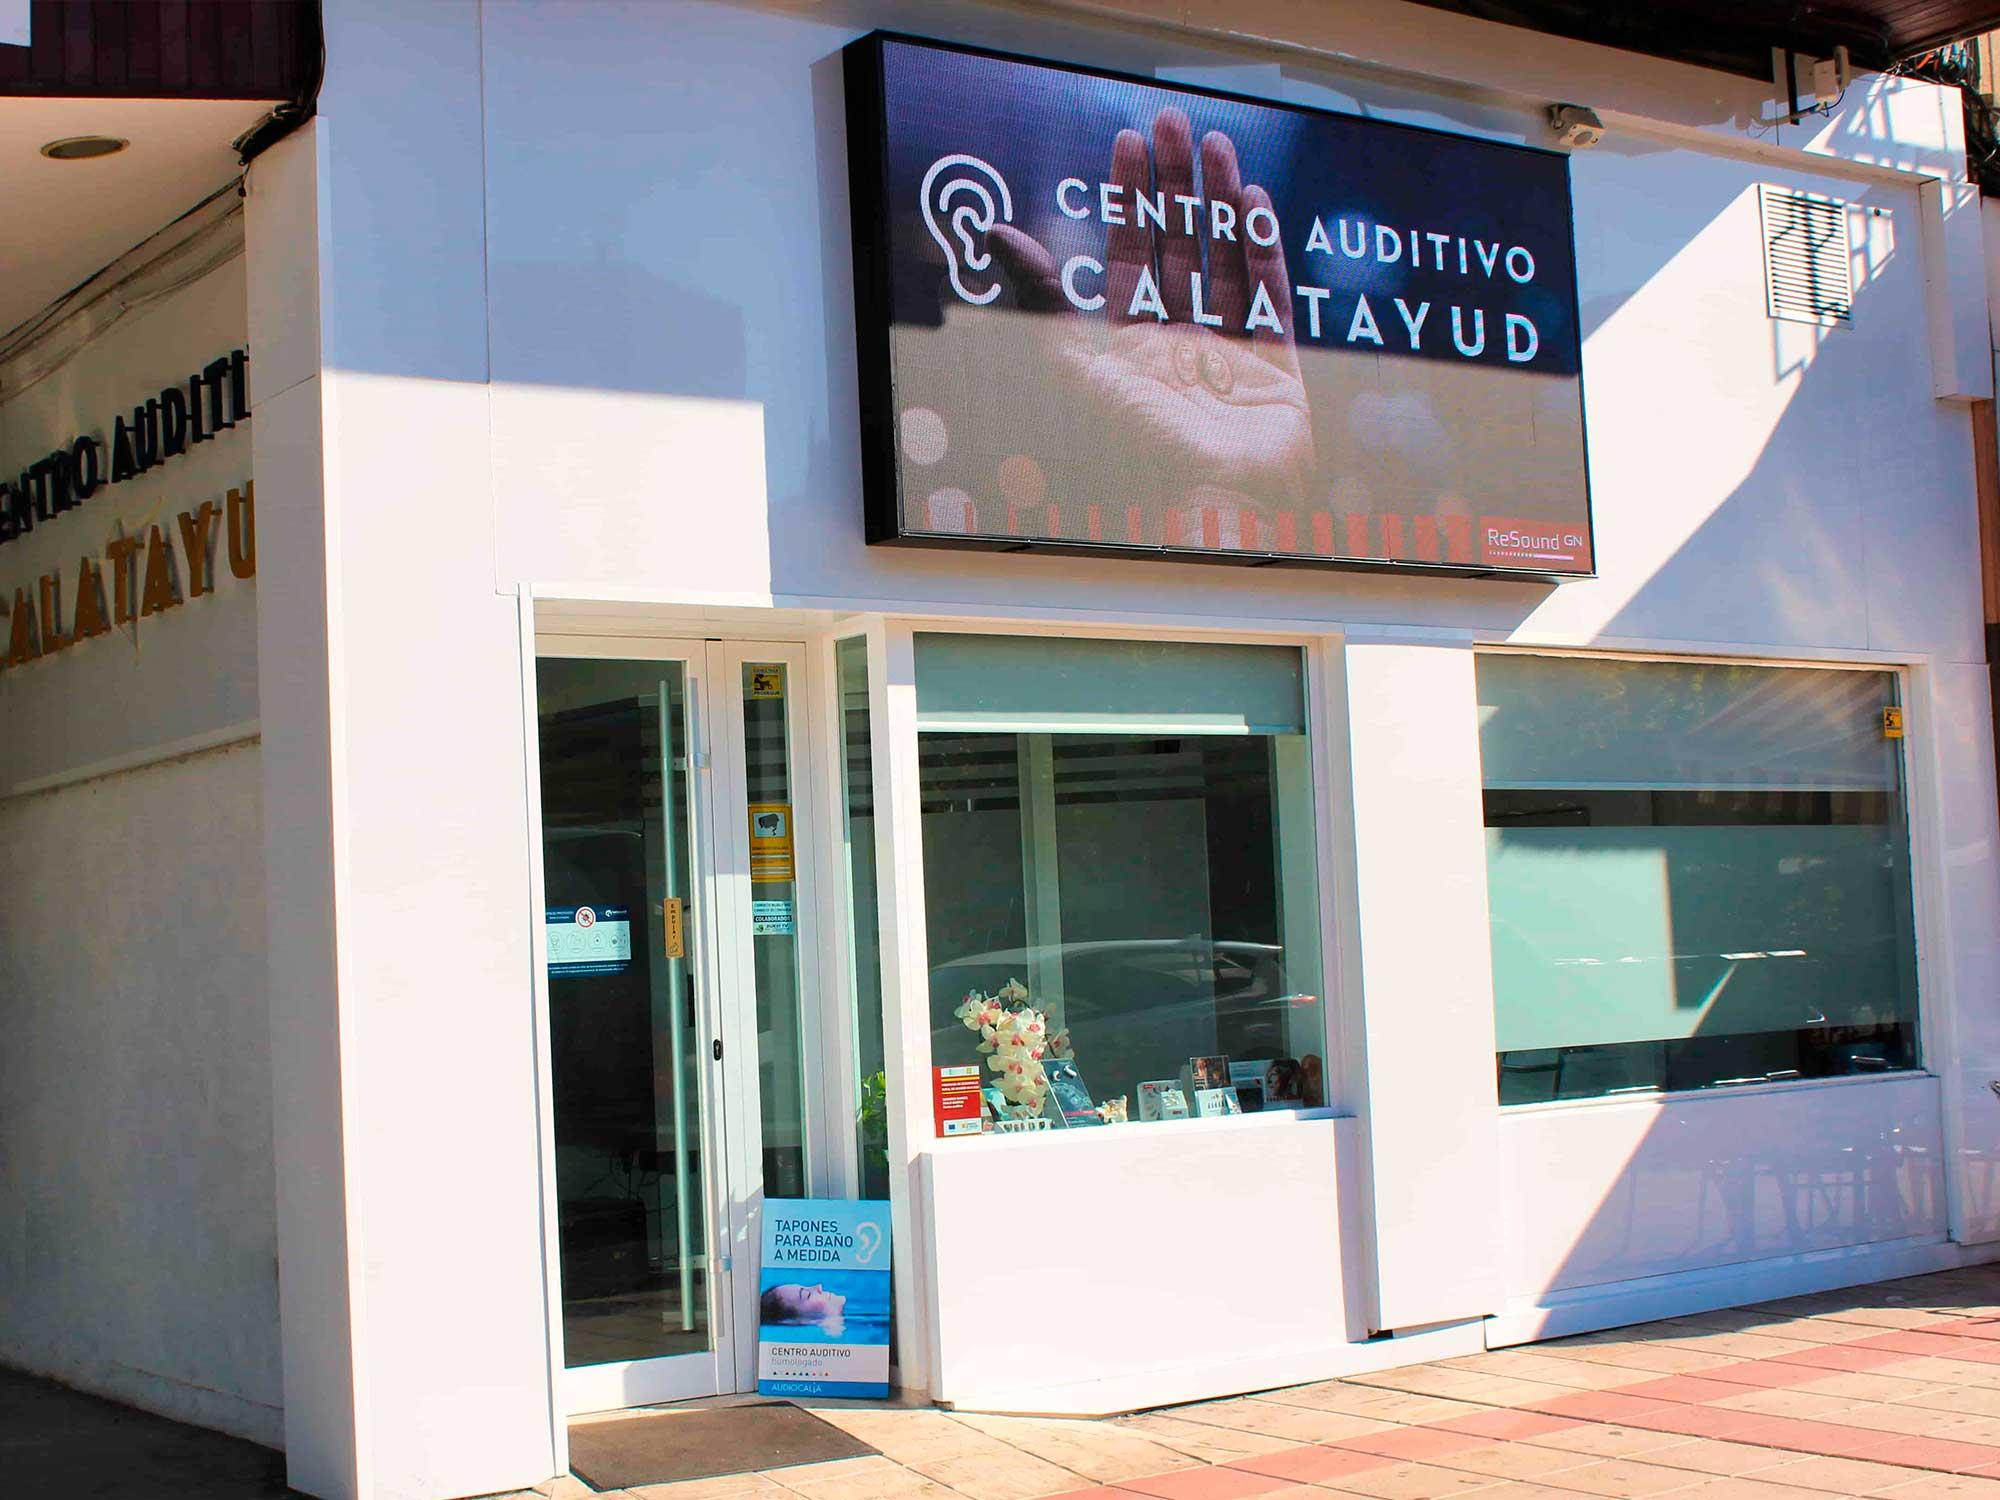 Pantalla centro auditivo Calatayud